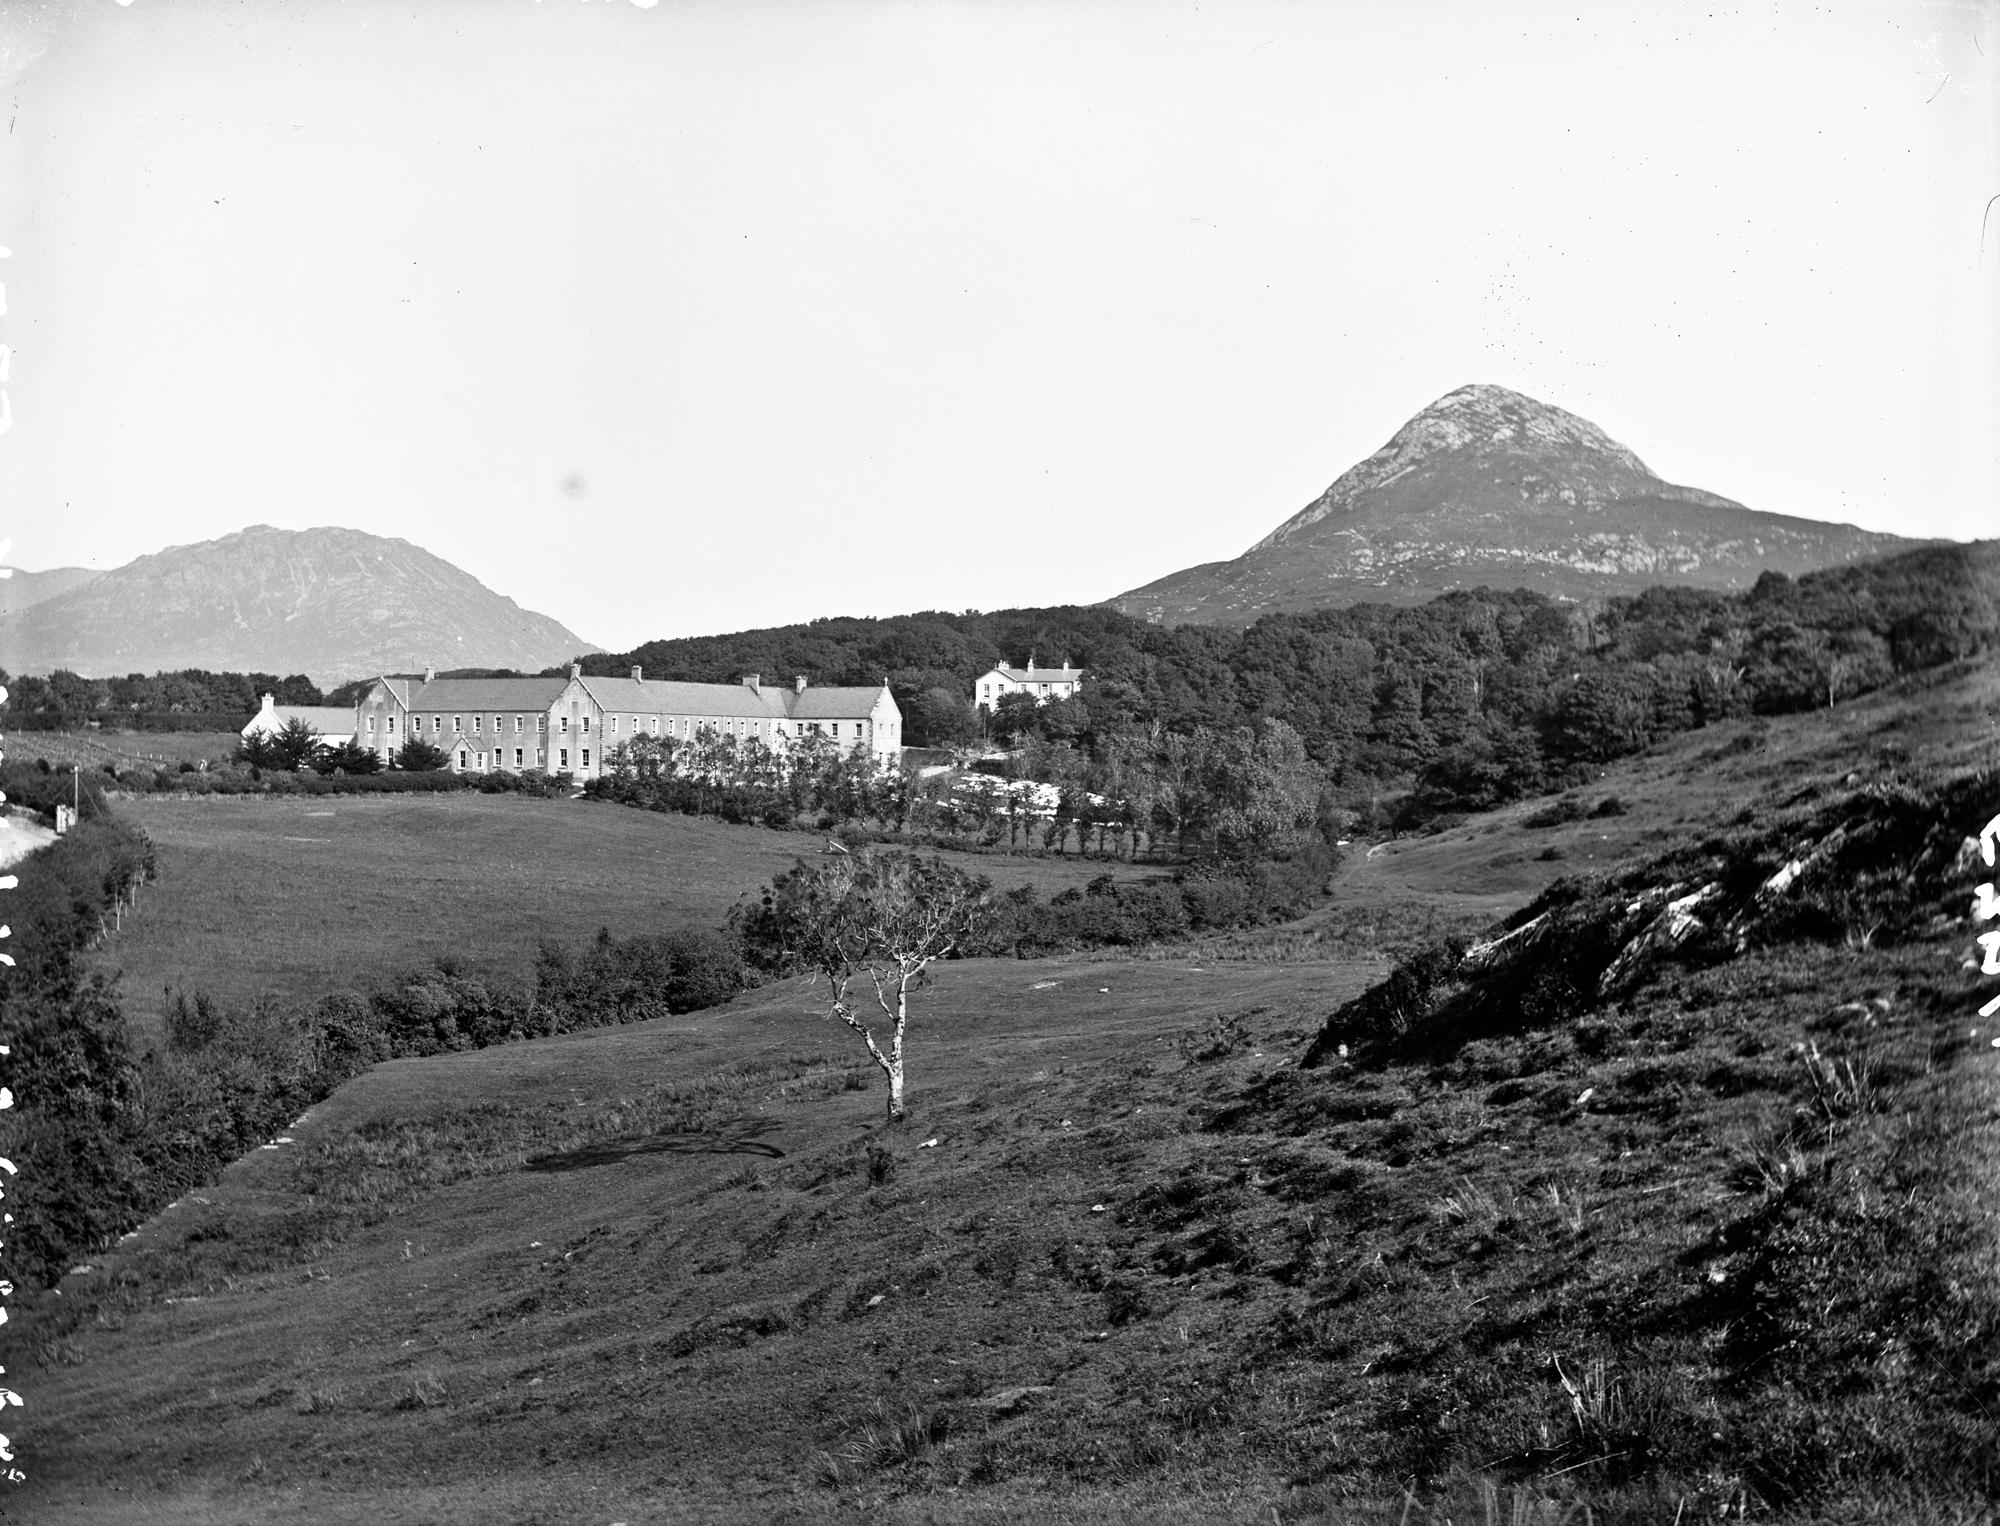 Industrial Schools, Letterfrack, Co. Galway